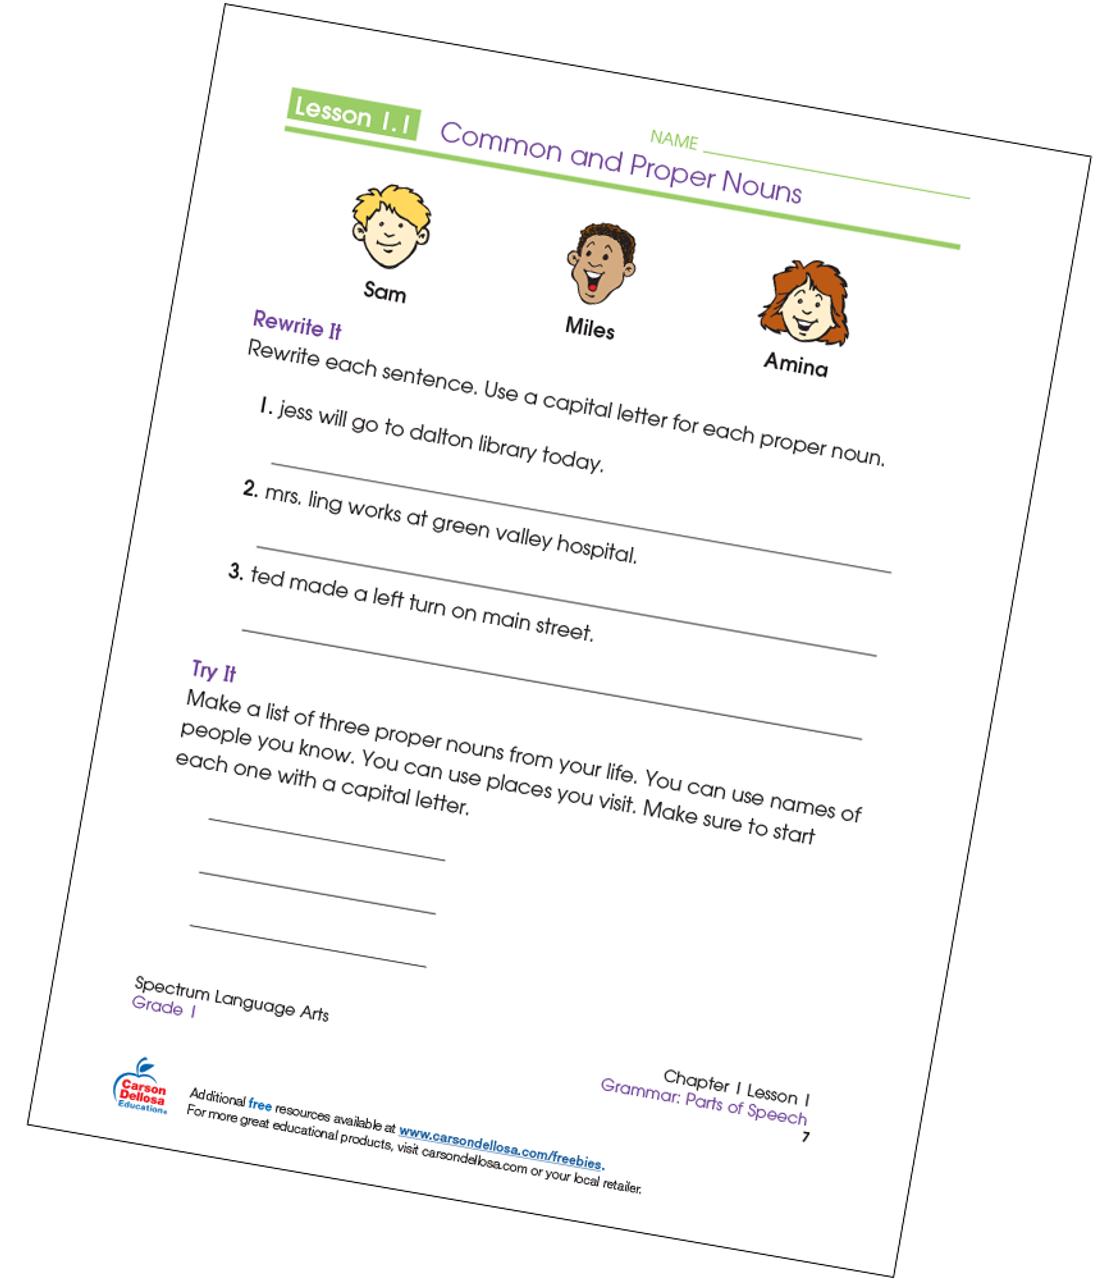 Writing Common and Proper Nouns Grade 1 Free Printable